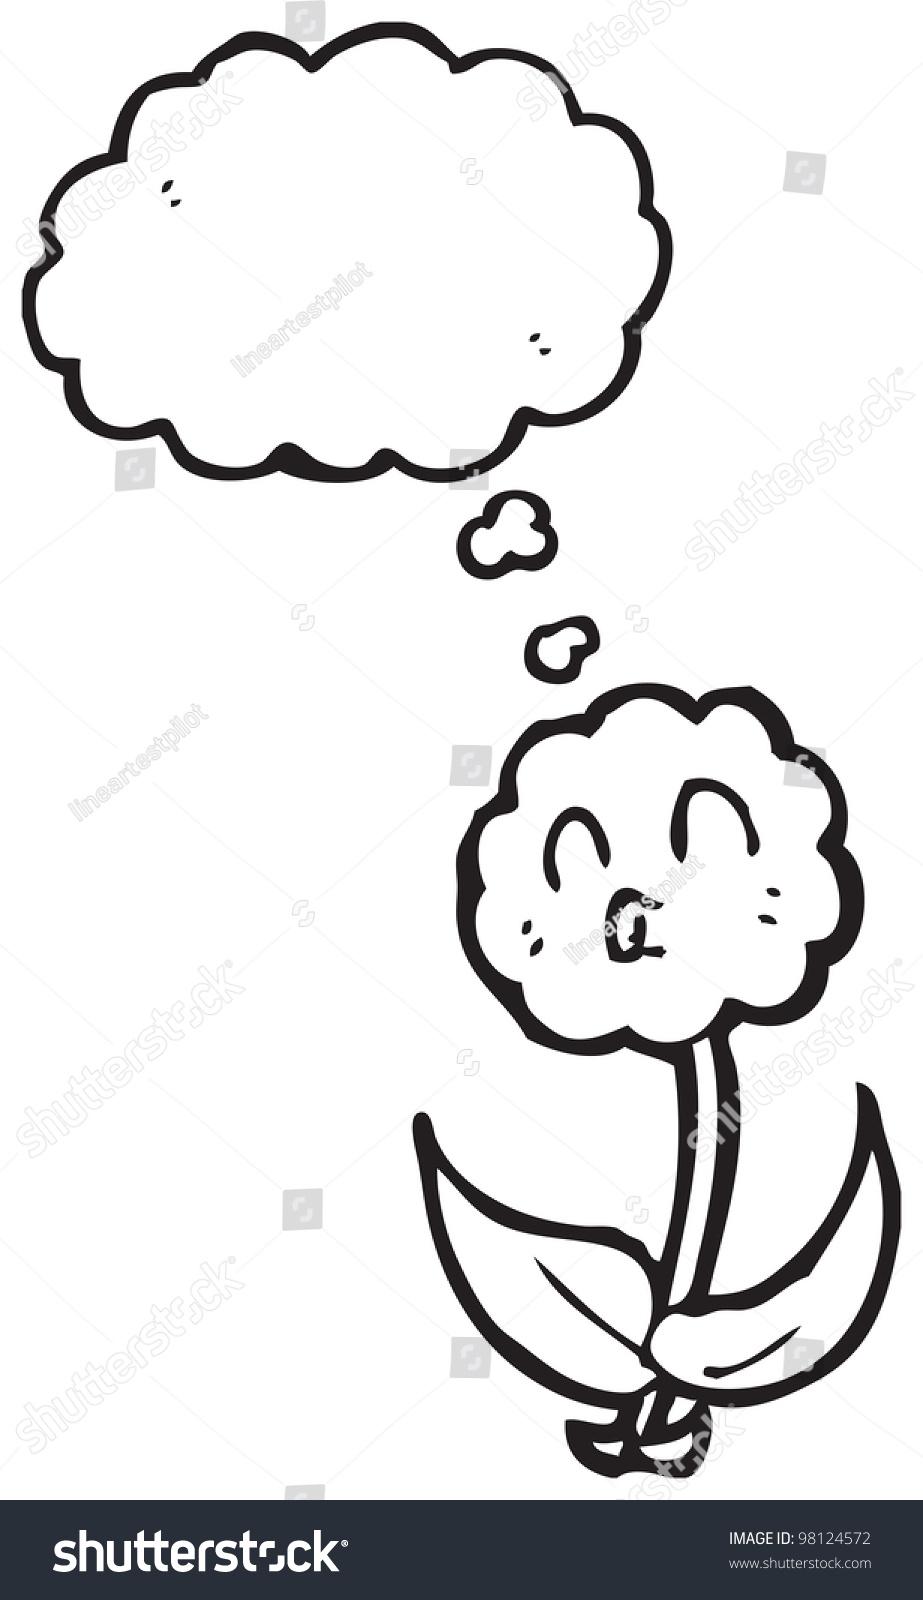 Cartoon Man Eating Flower With Speech Bubble Ez Canvas